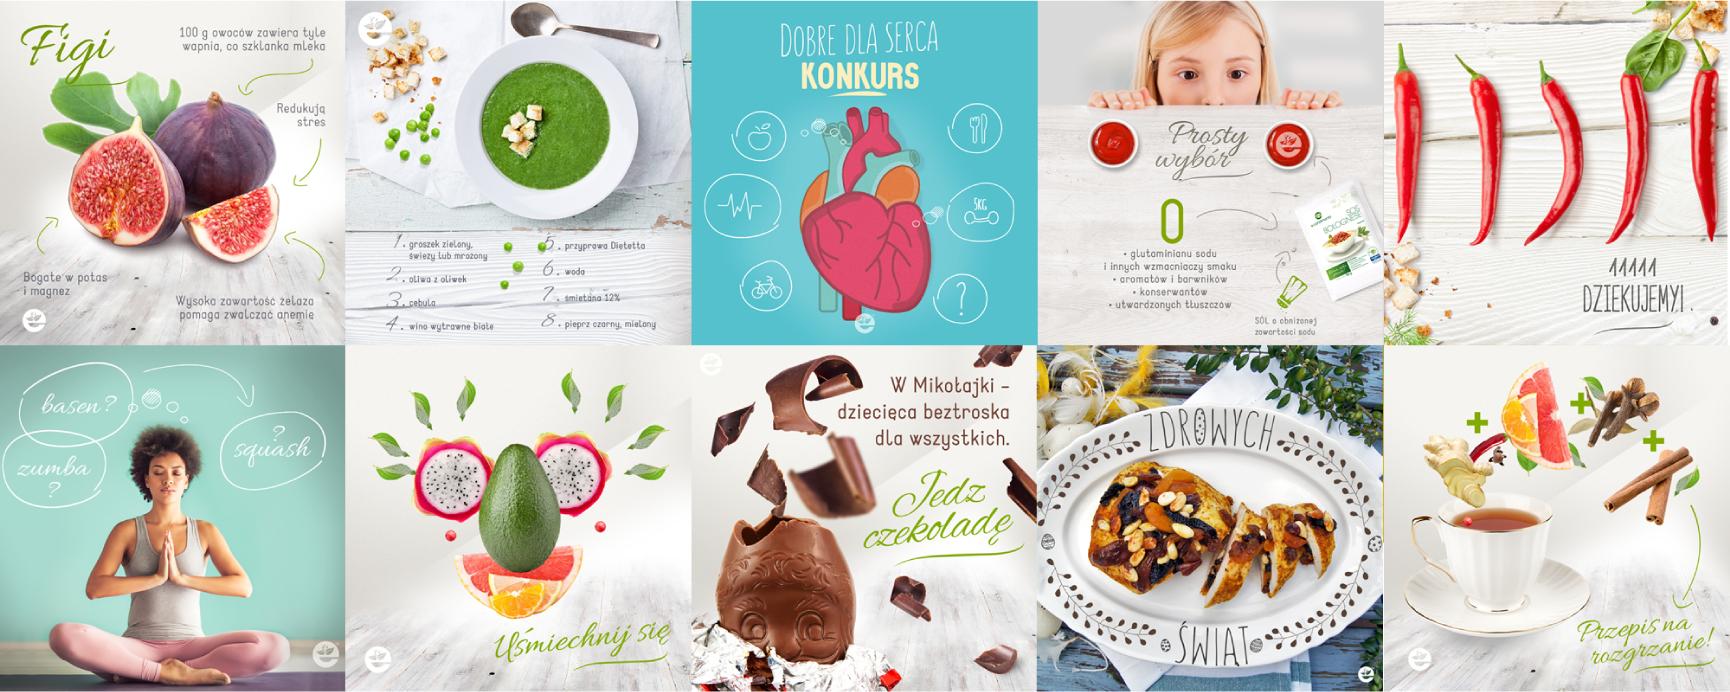 e-condiment - I love life, I eat heathily